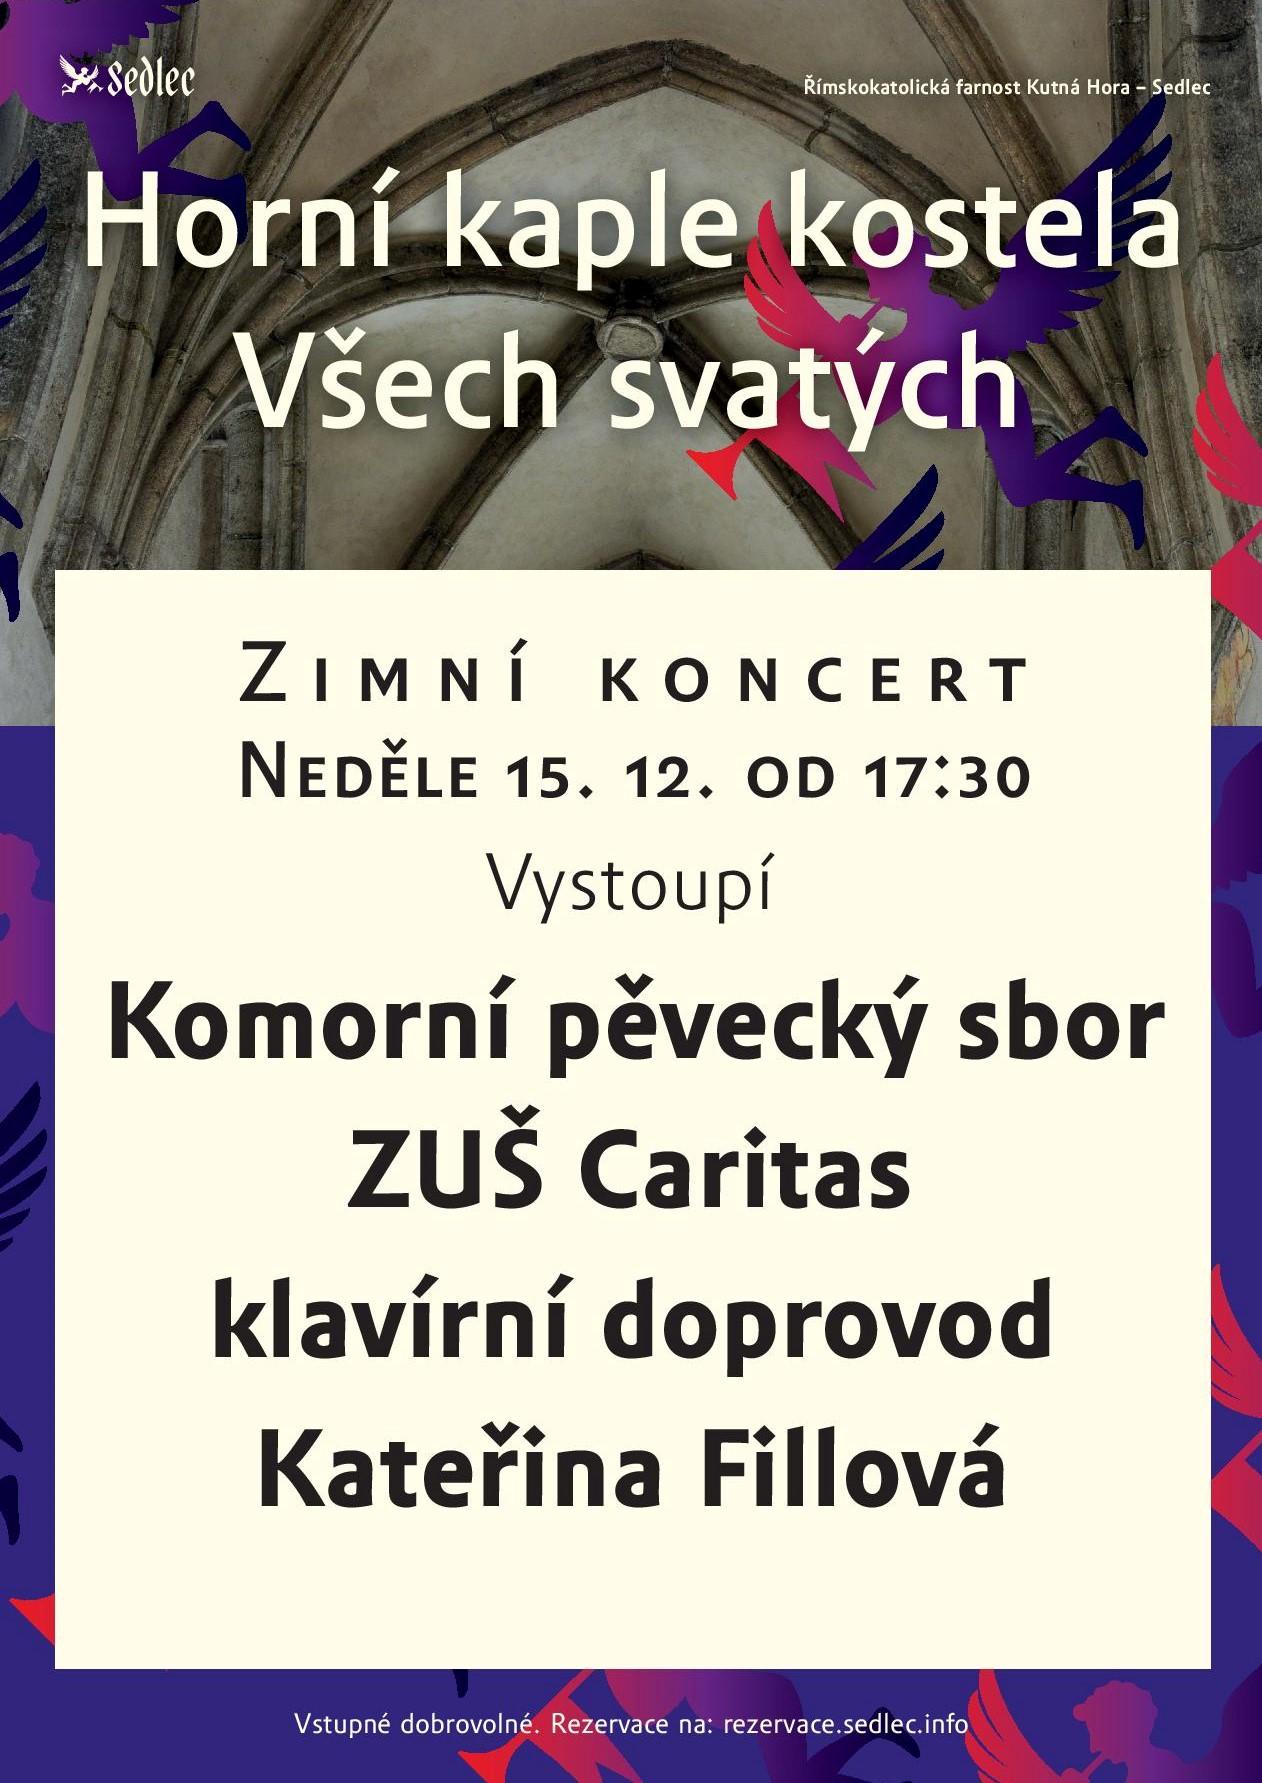 7256-zimni-koncert-horni-kaple-2019-a4-page-001.jpg